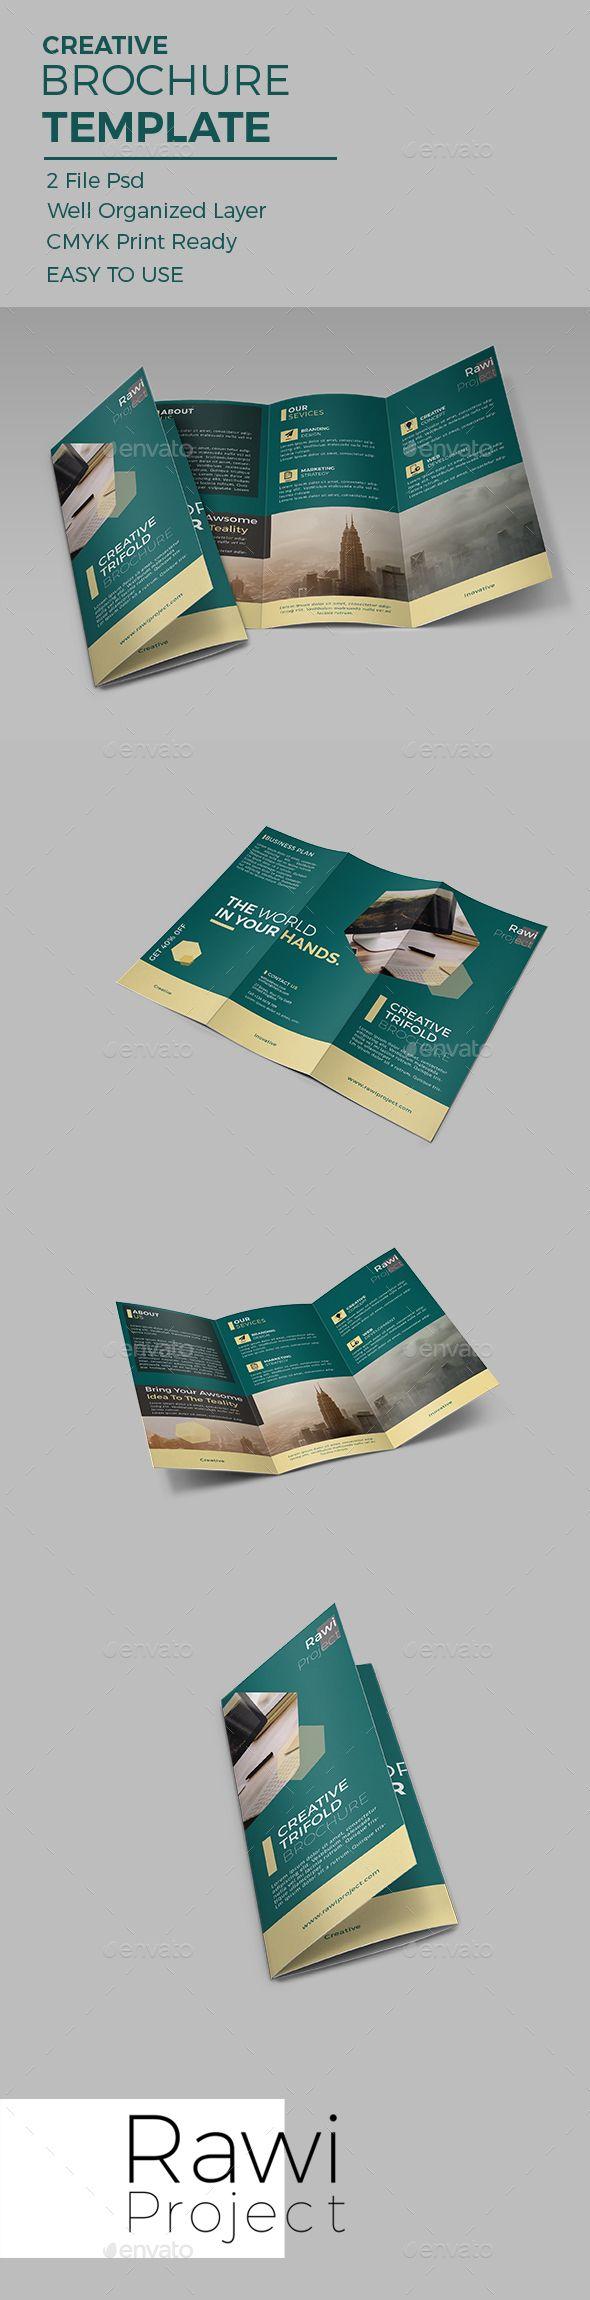 Creative Brochure Template Brochures Print Templates